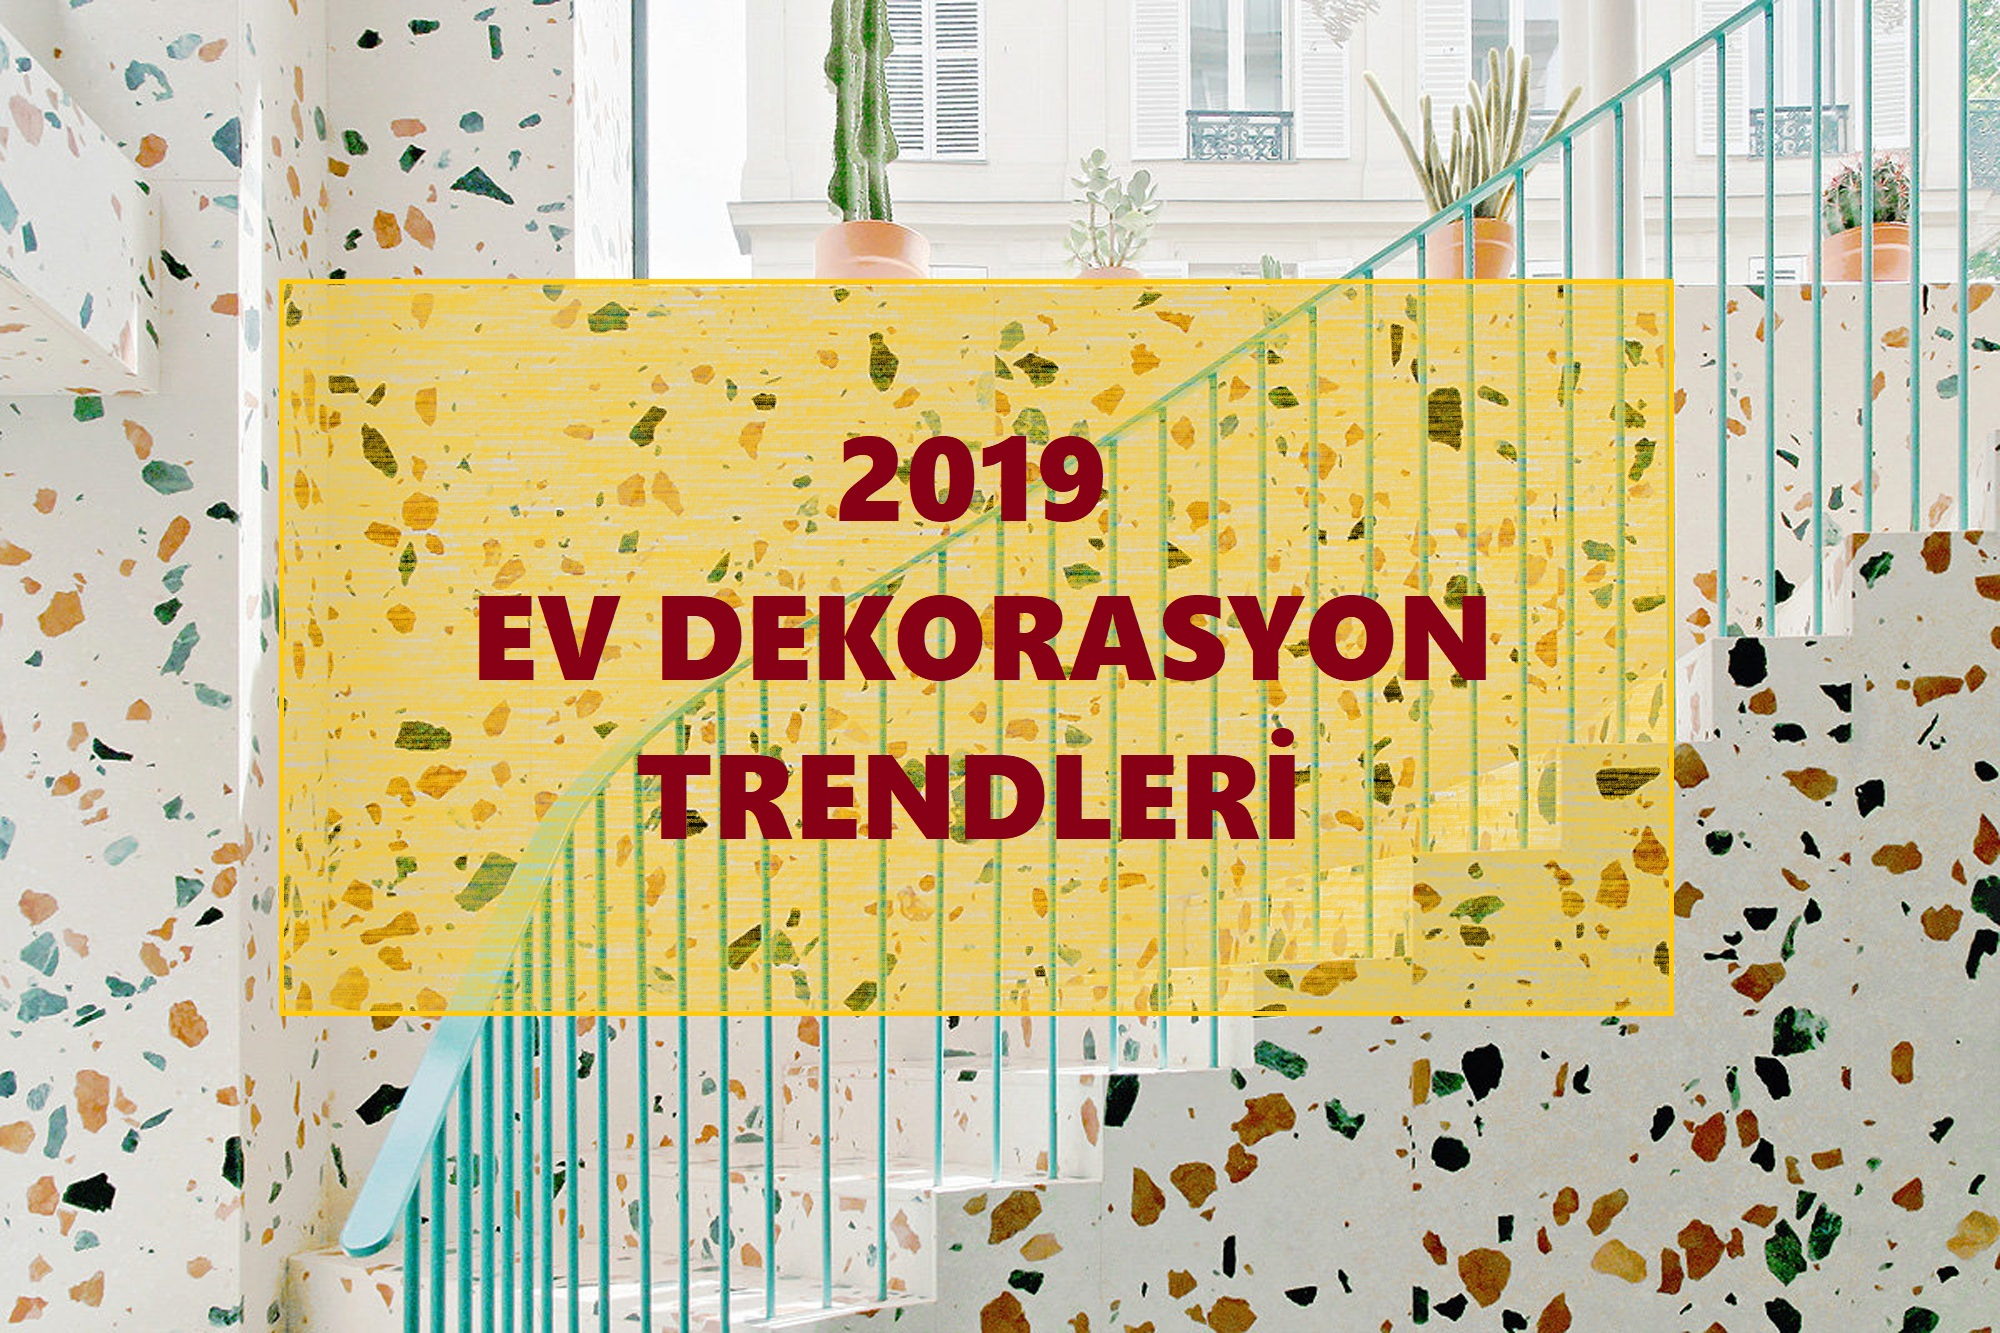 Ev Dekorasyon Trendleri 2019